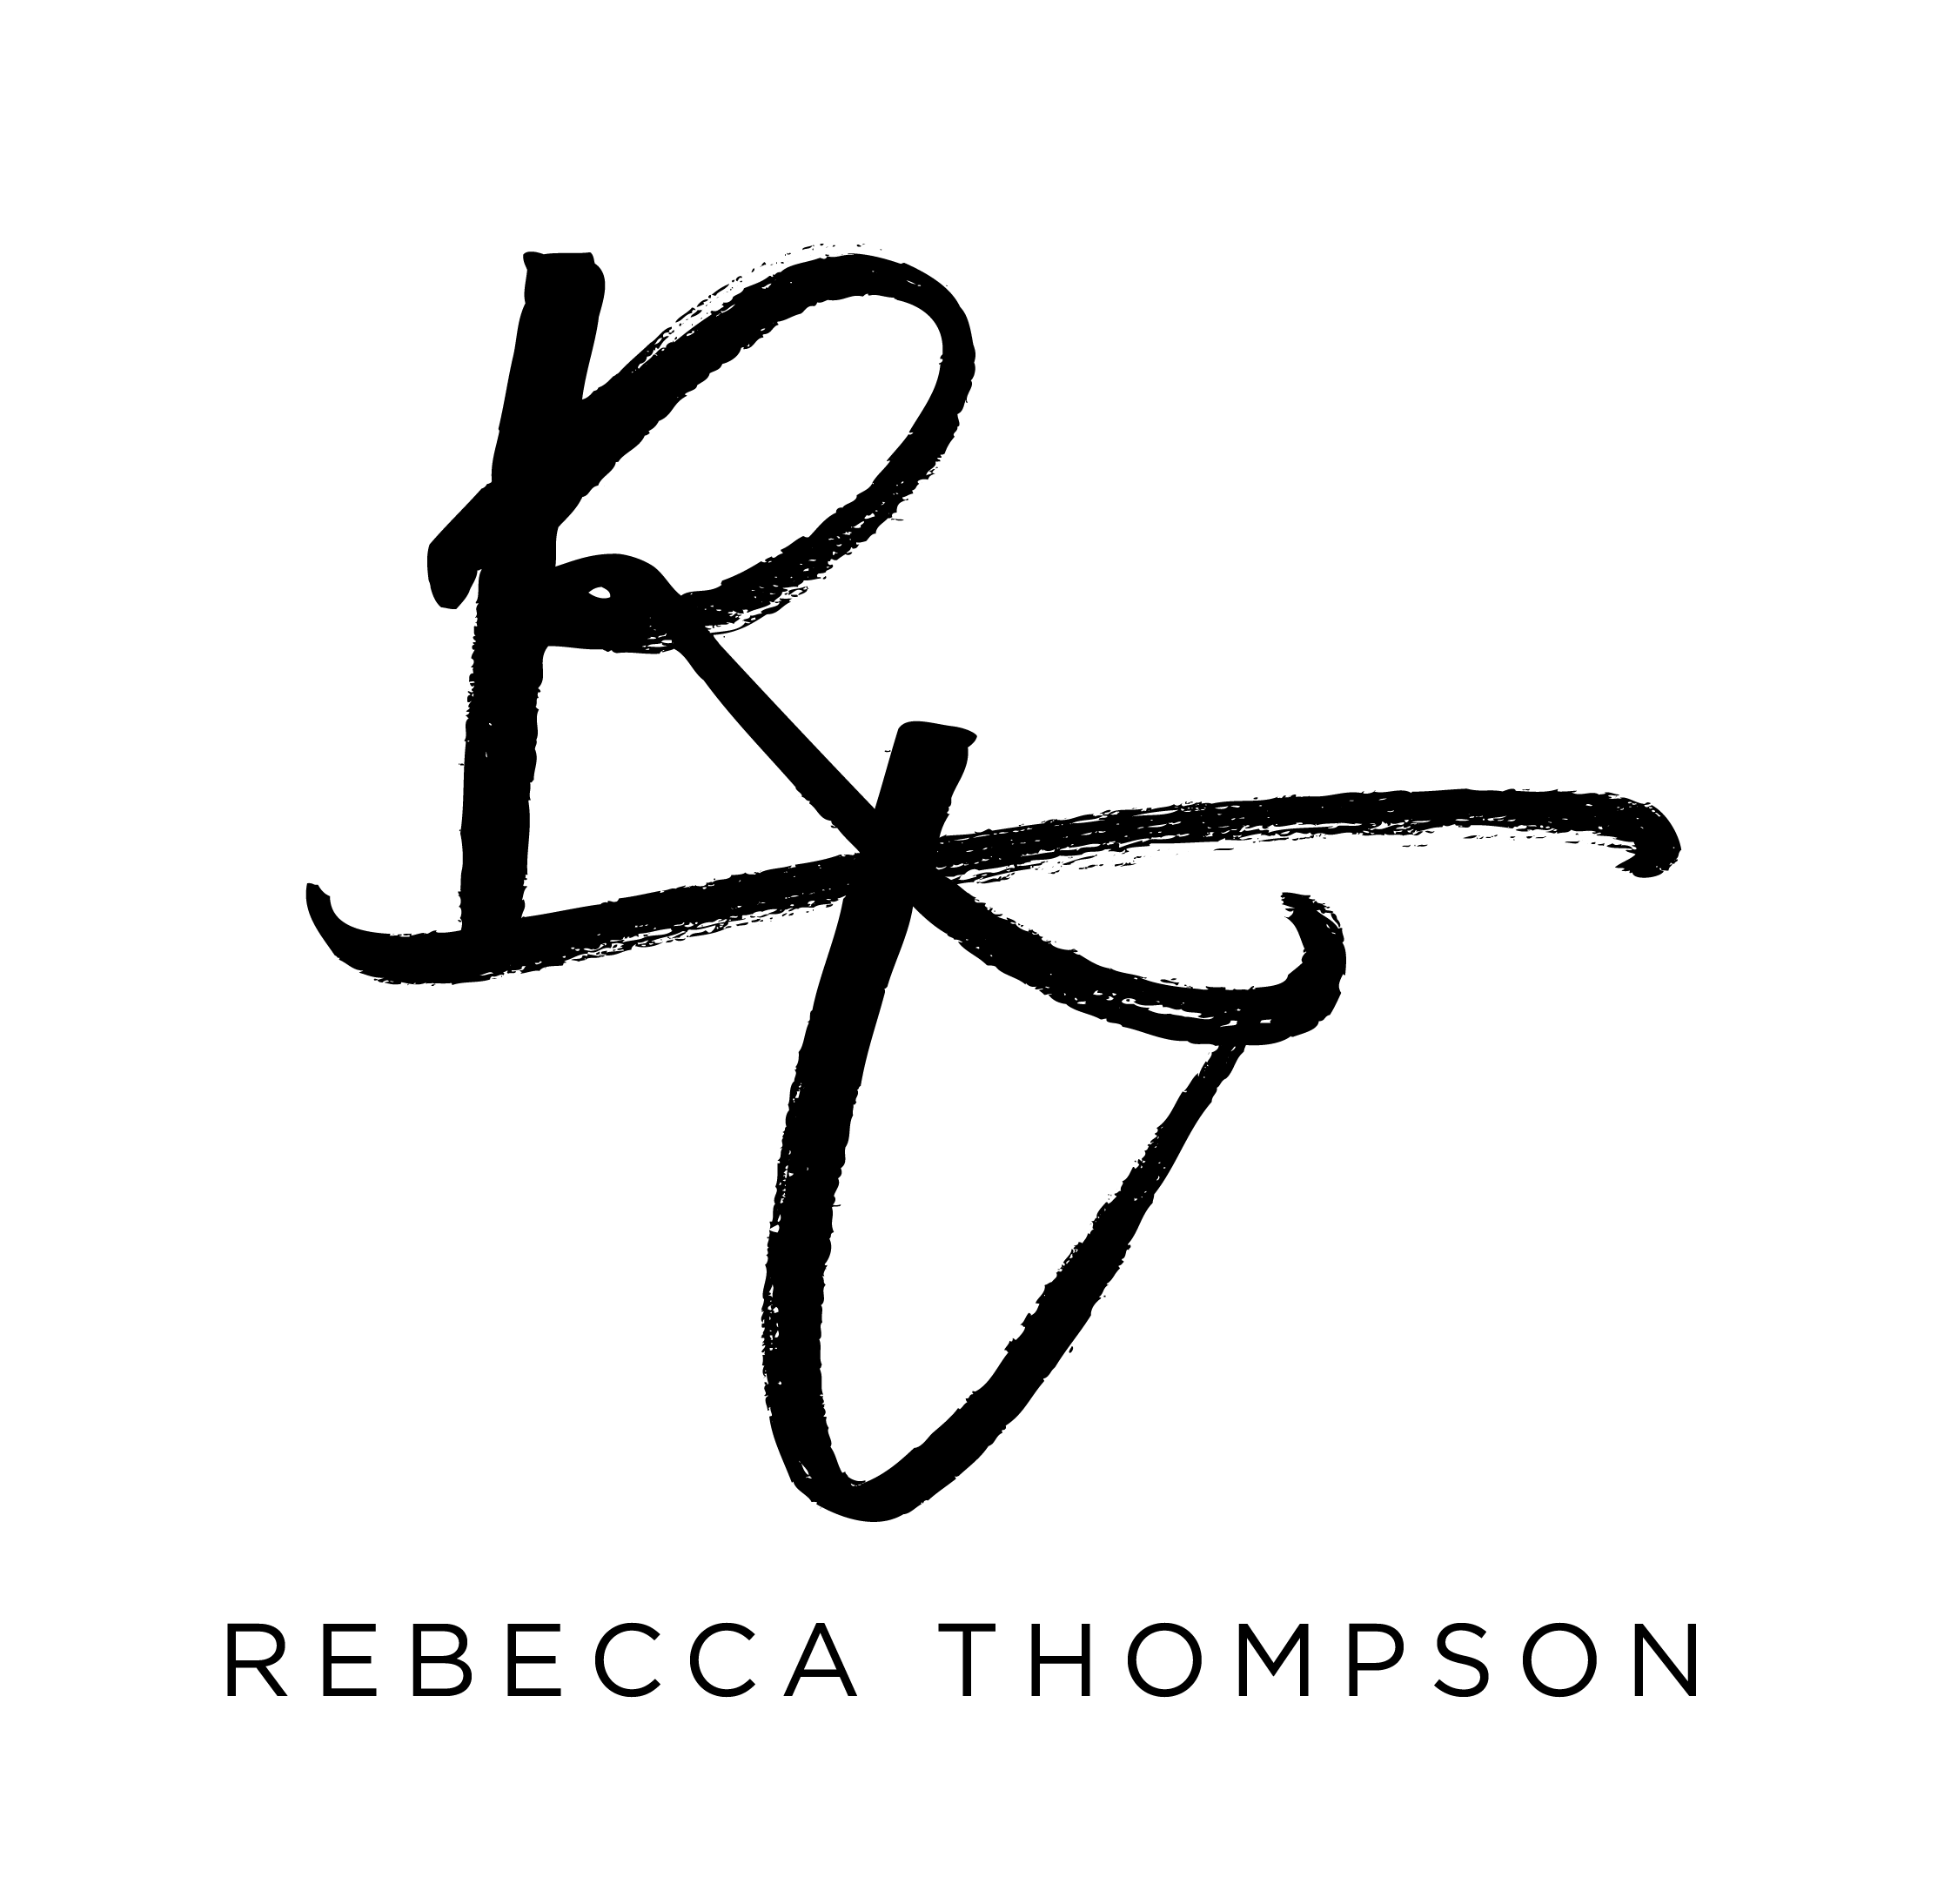 Rebecca Thompson_Logos-07.png